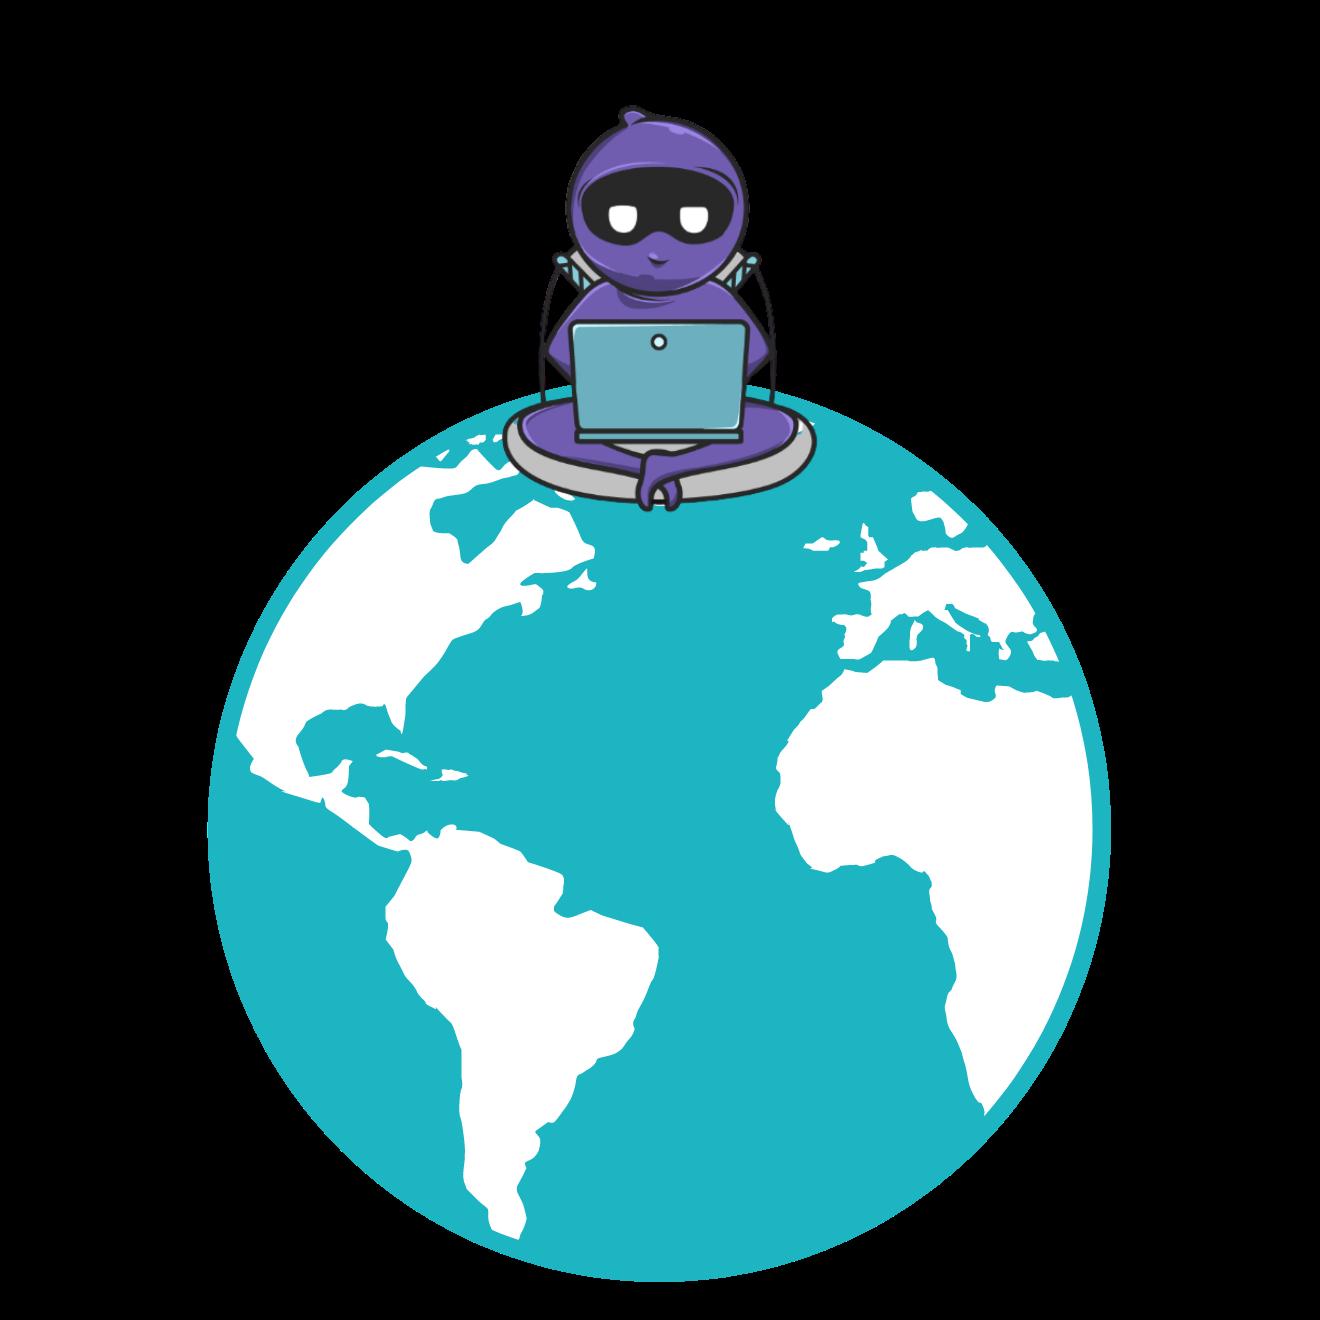 A Ninja sitting on top of the world.